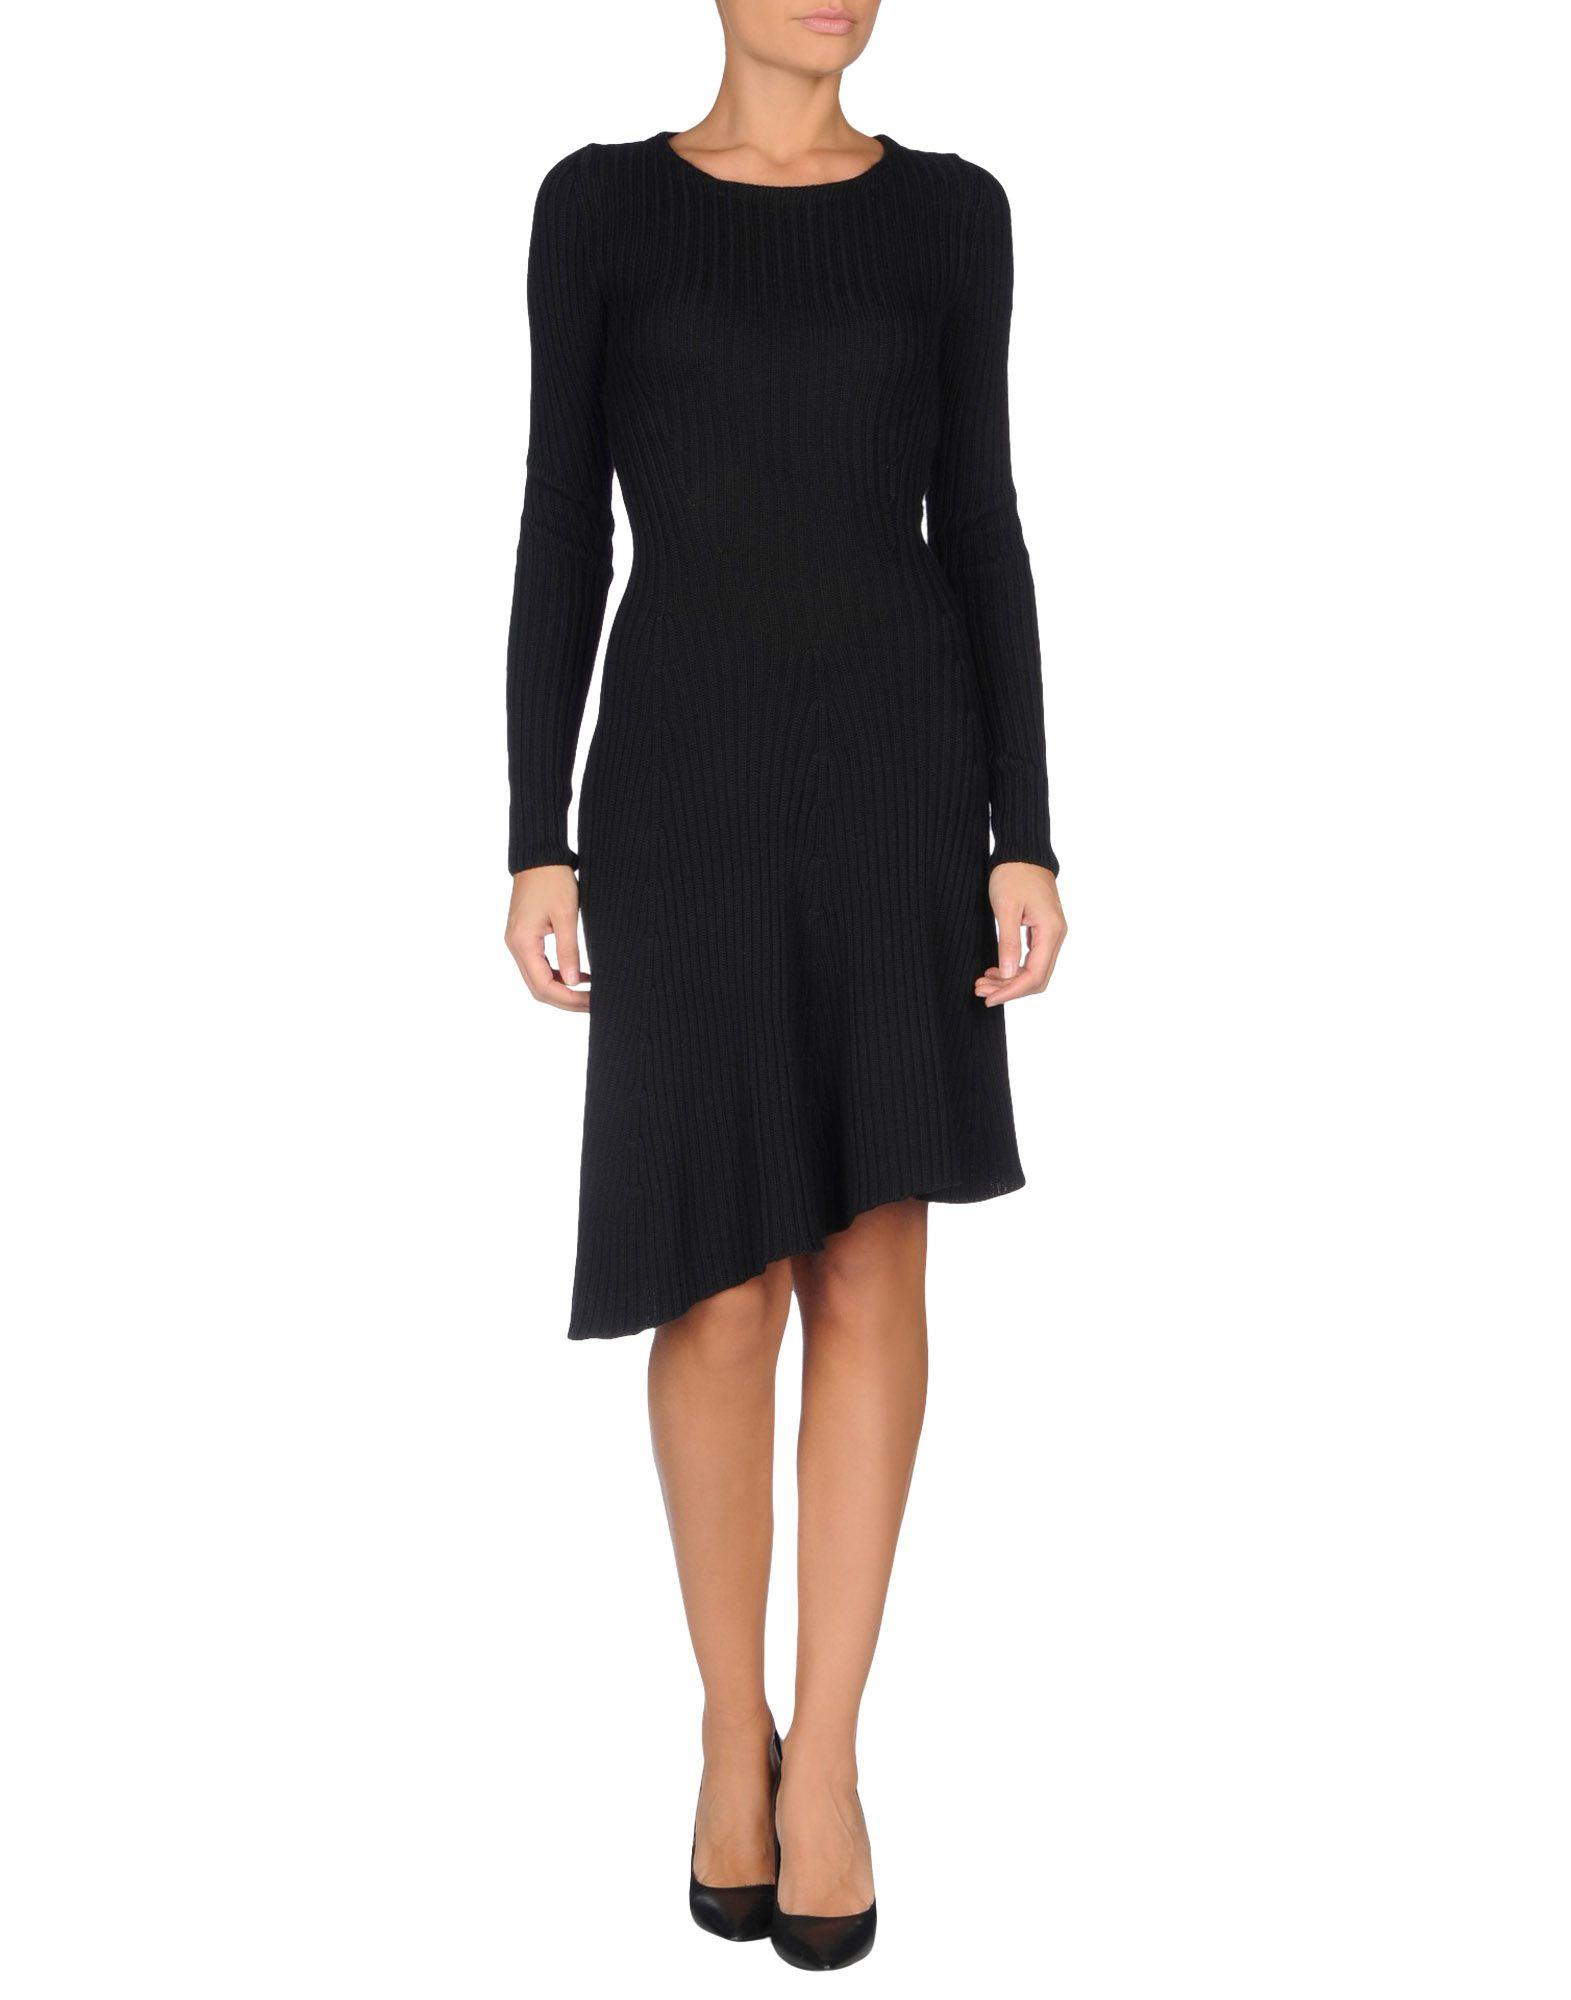 dior short dresses - photo #34